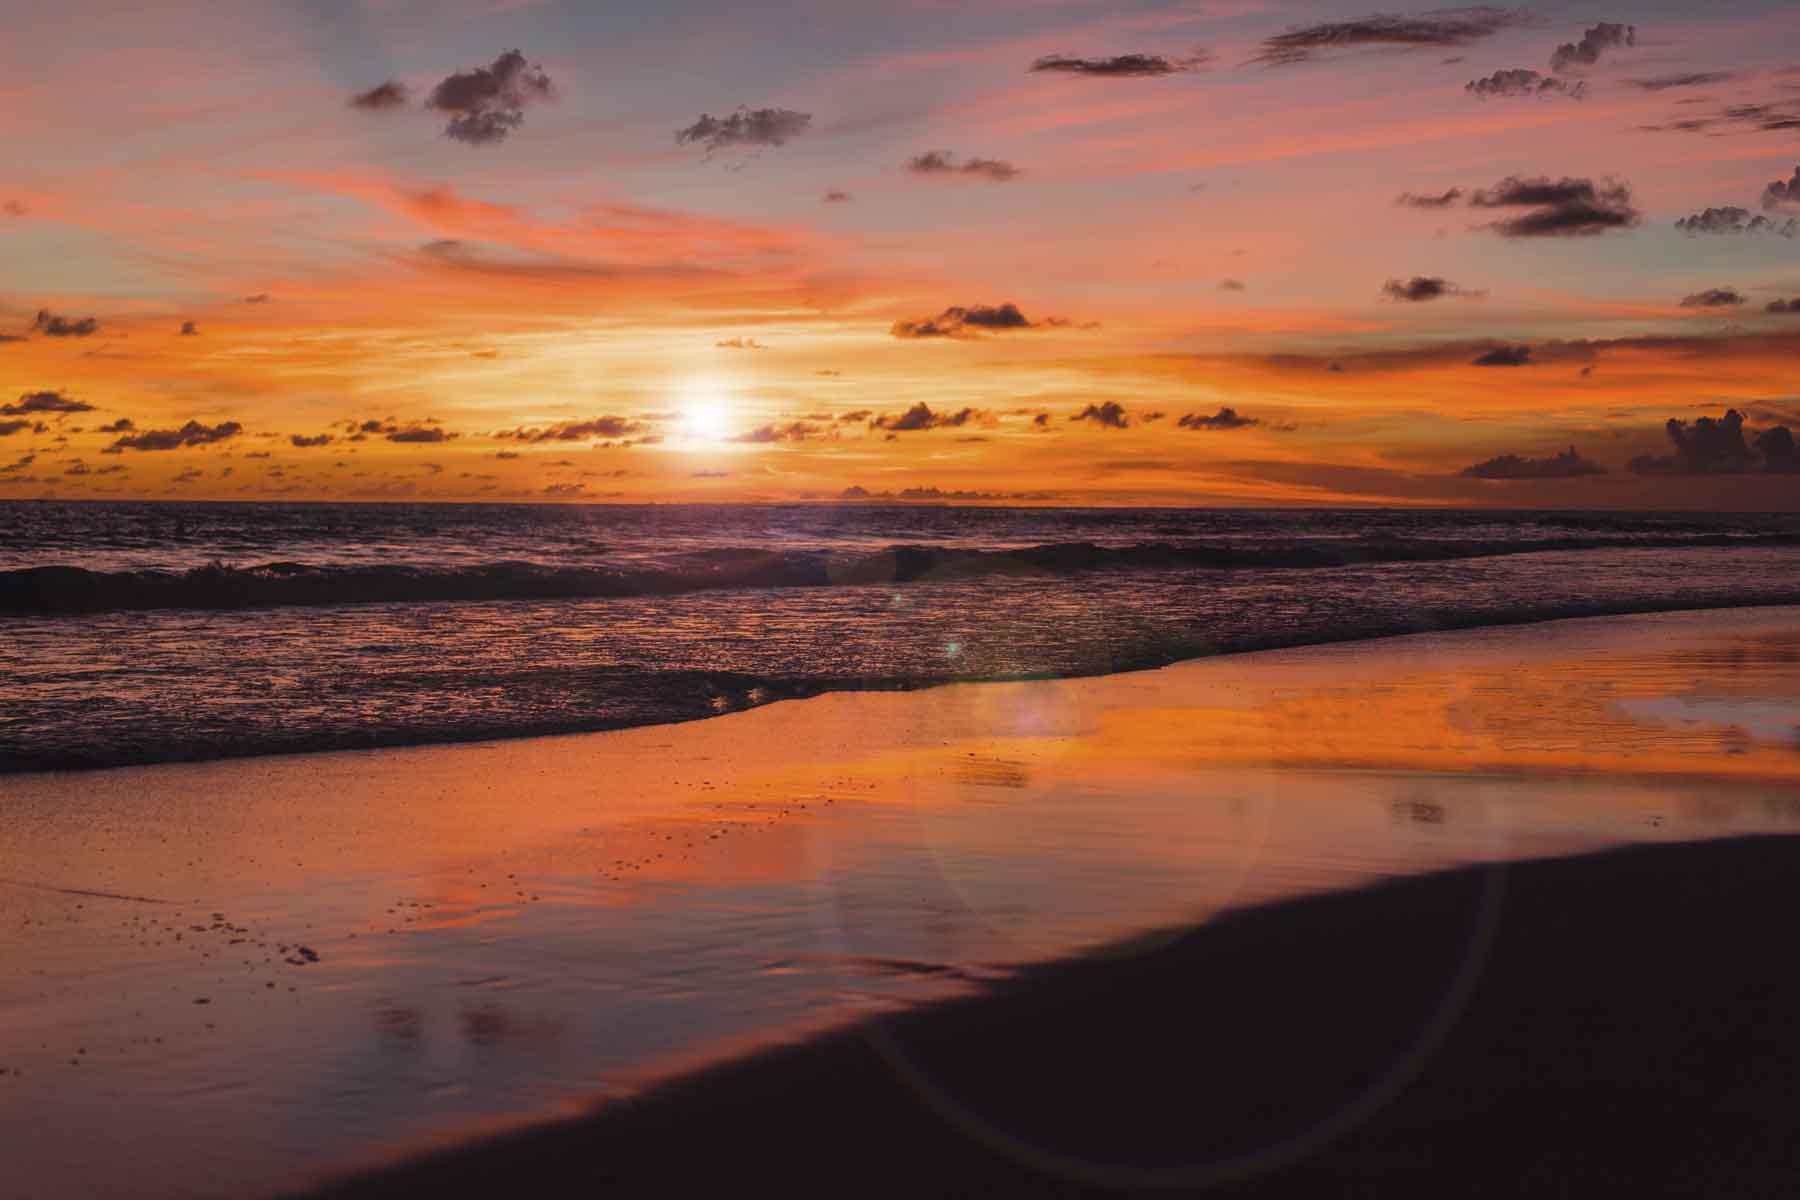 pemandangan-sunset-pantai-kuta-bali